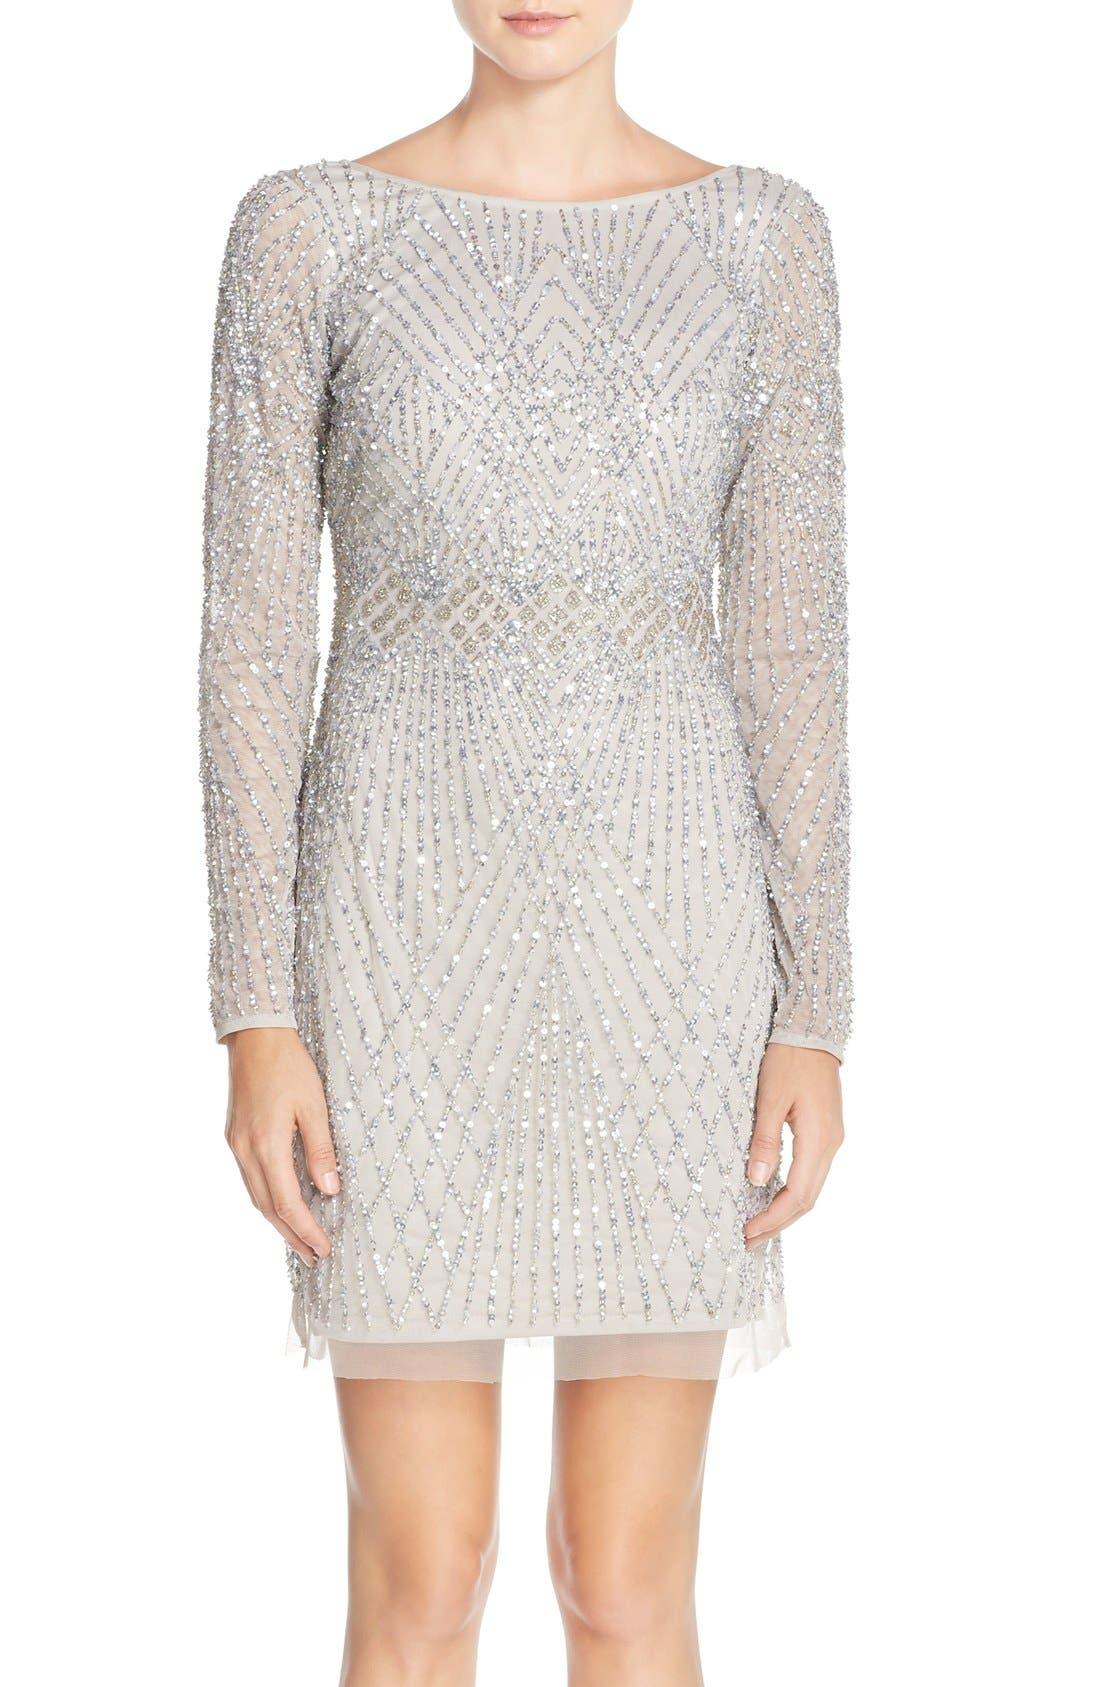 Main Image - Aidan Mattox Embellished Mesh Sheath Dress